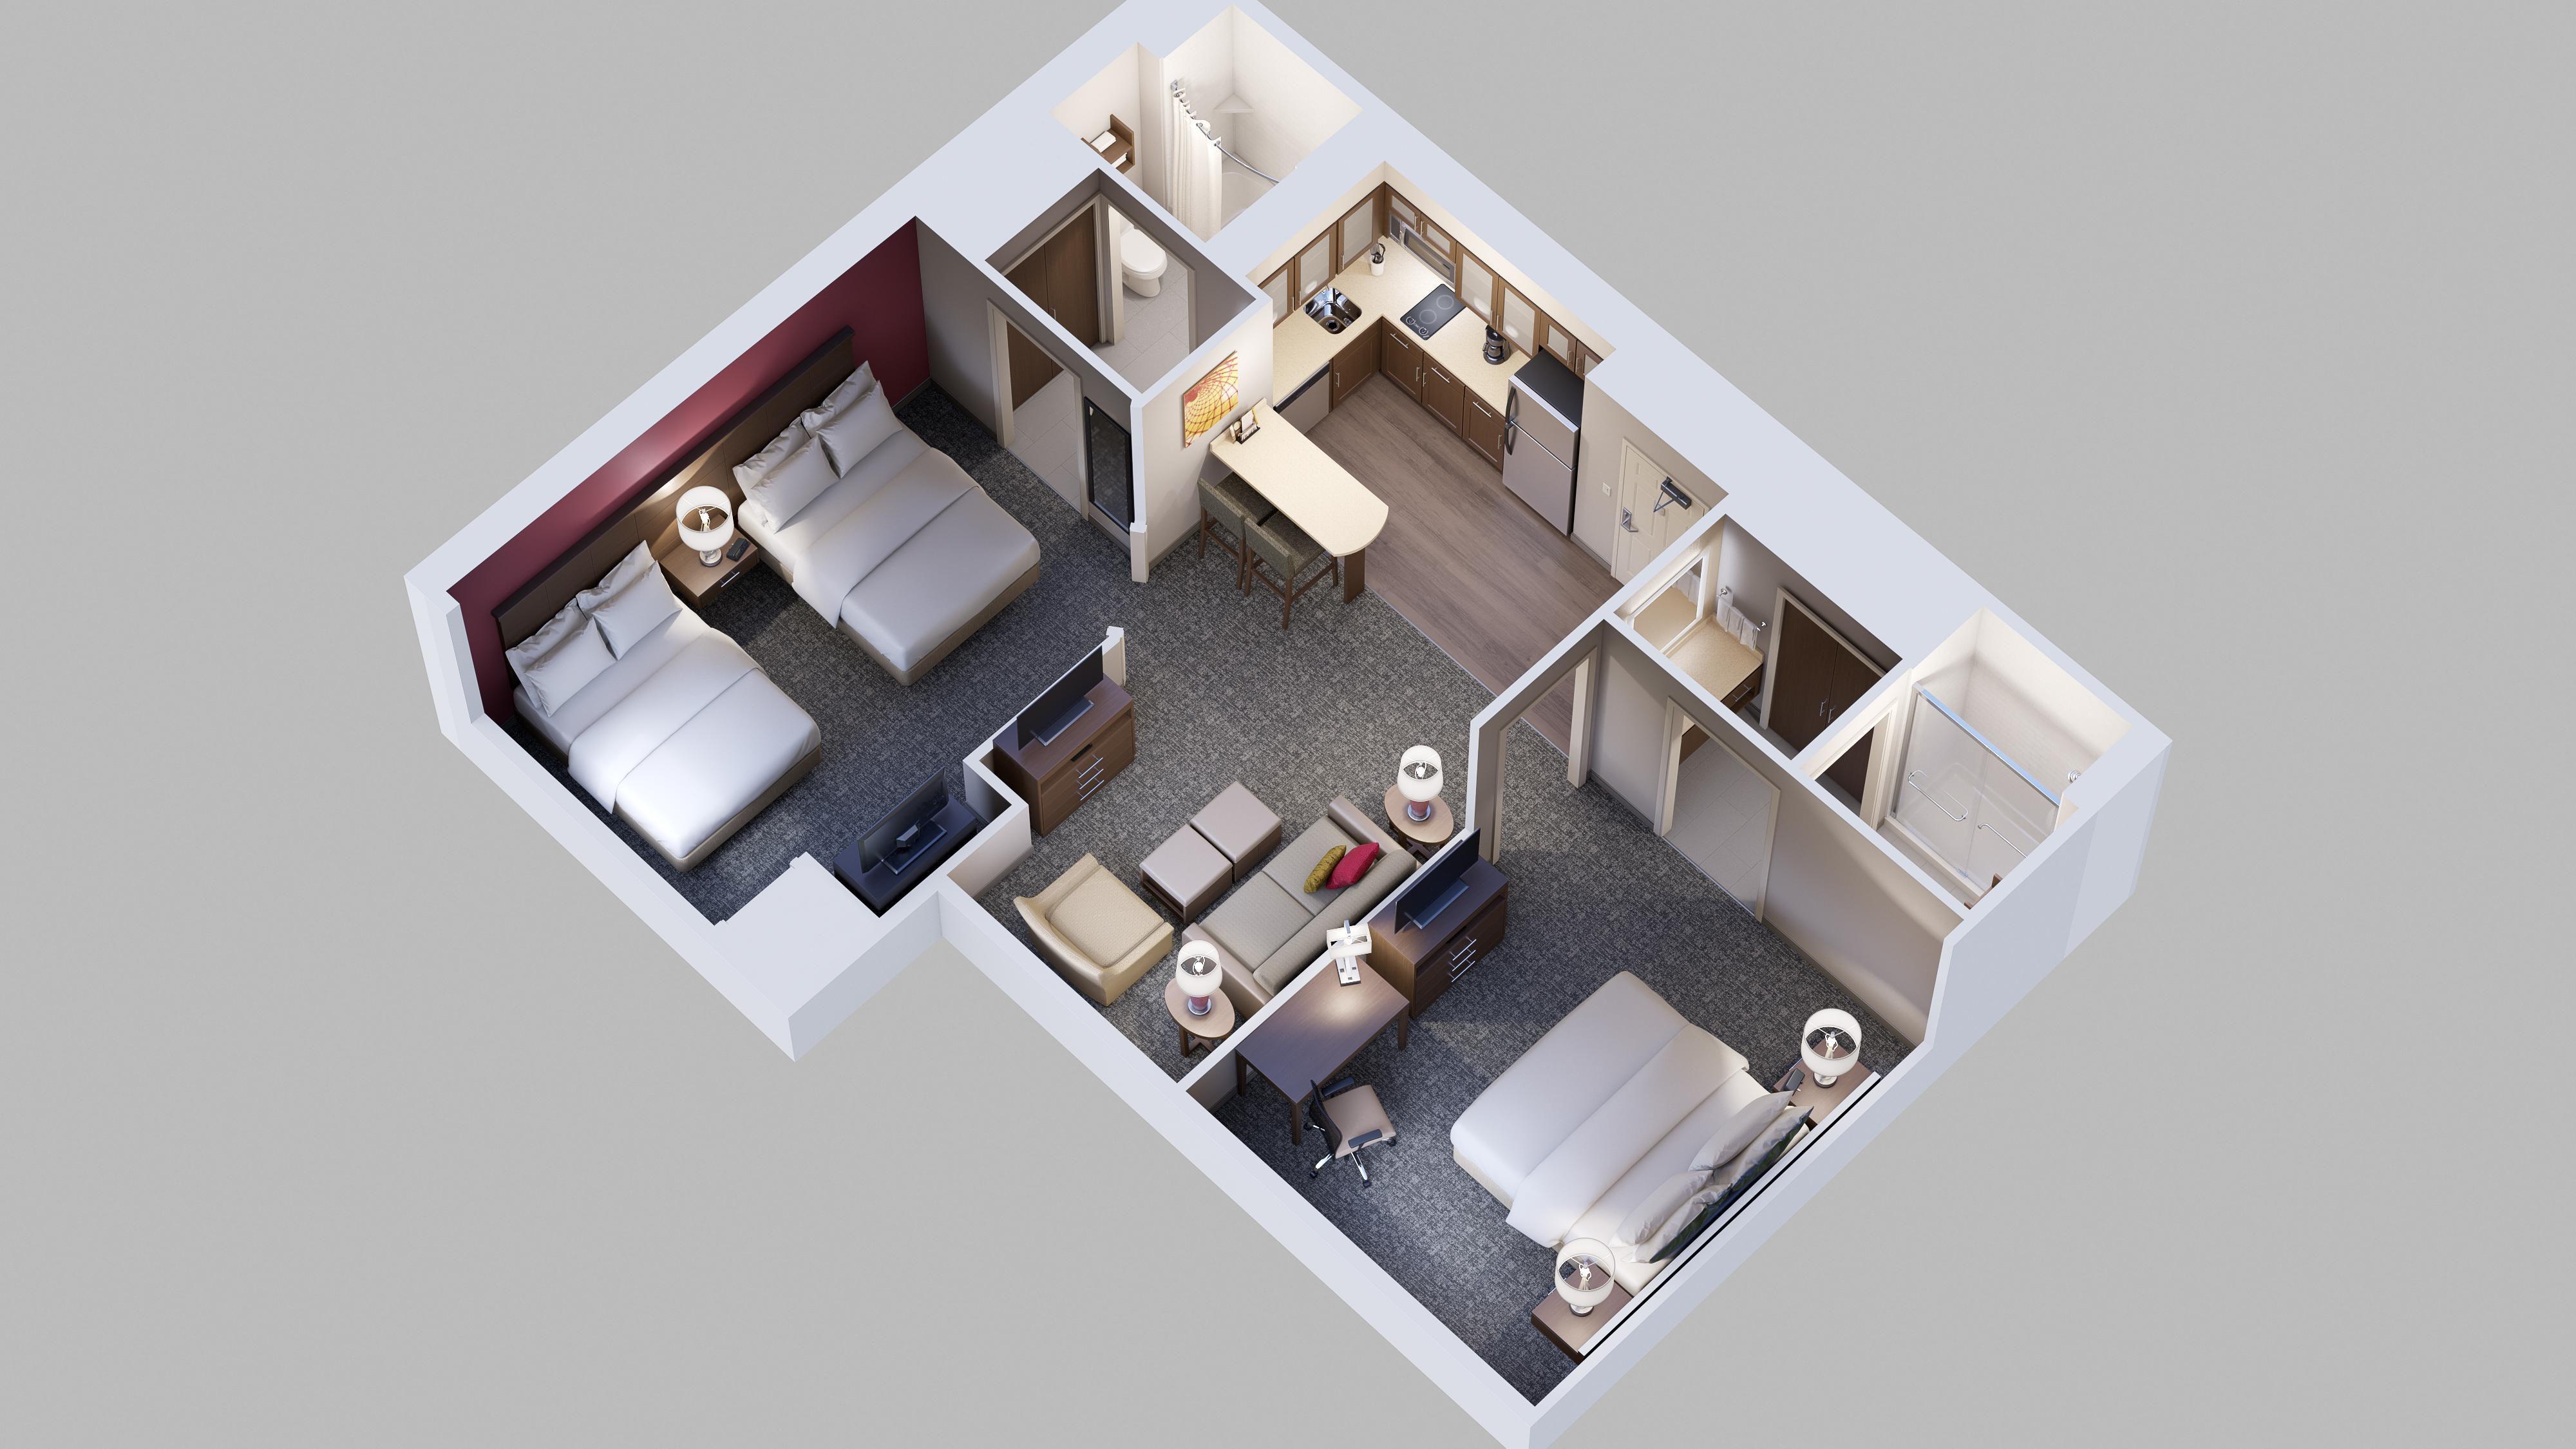 Staybridge Suites West Edmonton - Extended Stay Hotel in Edmonton